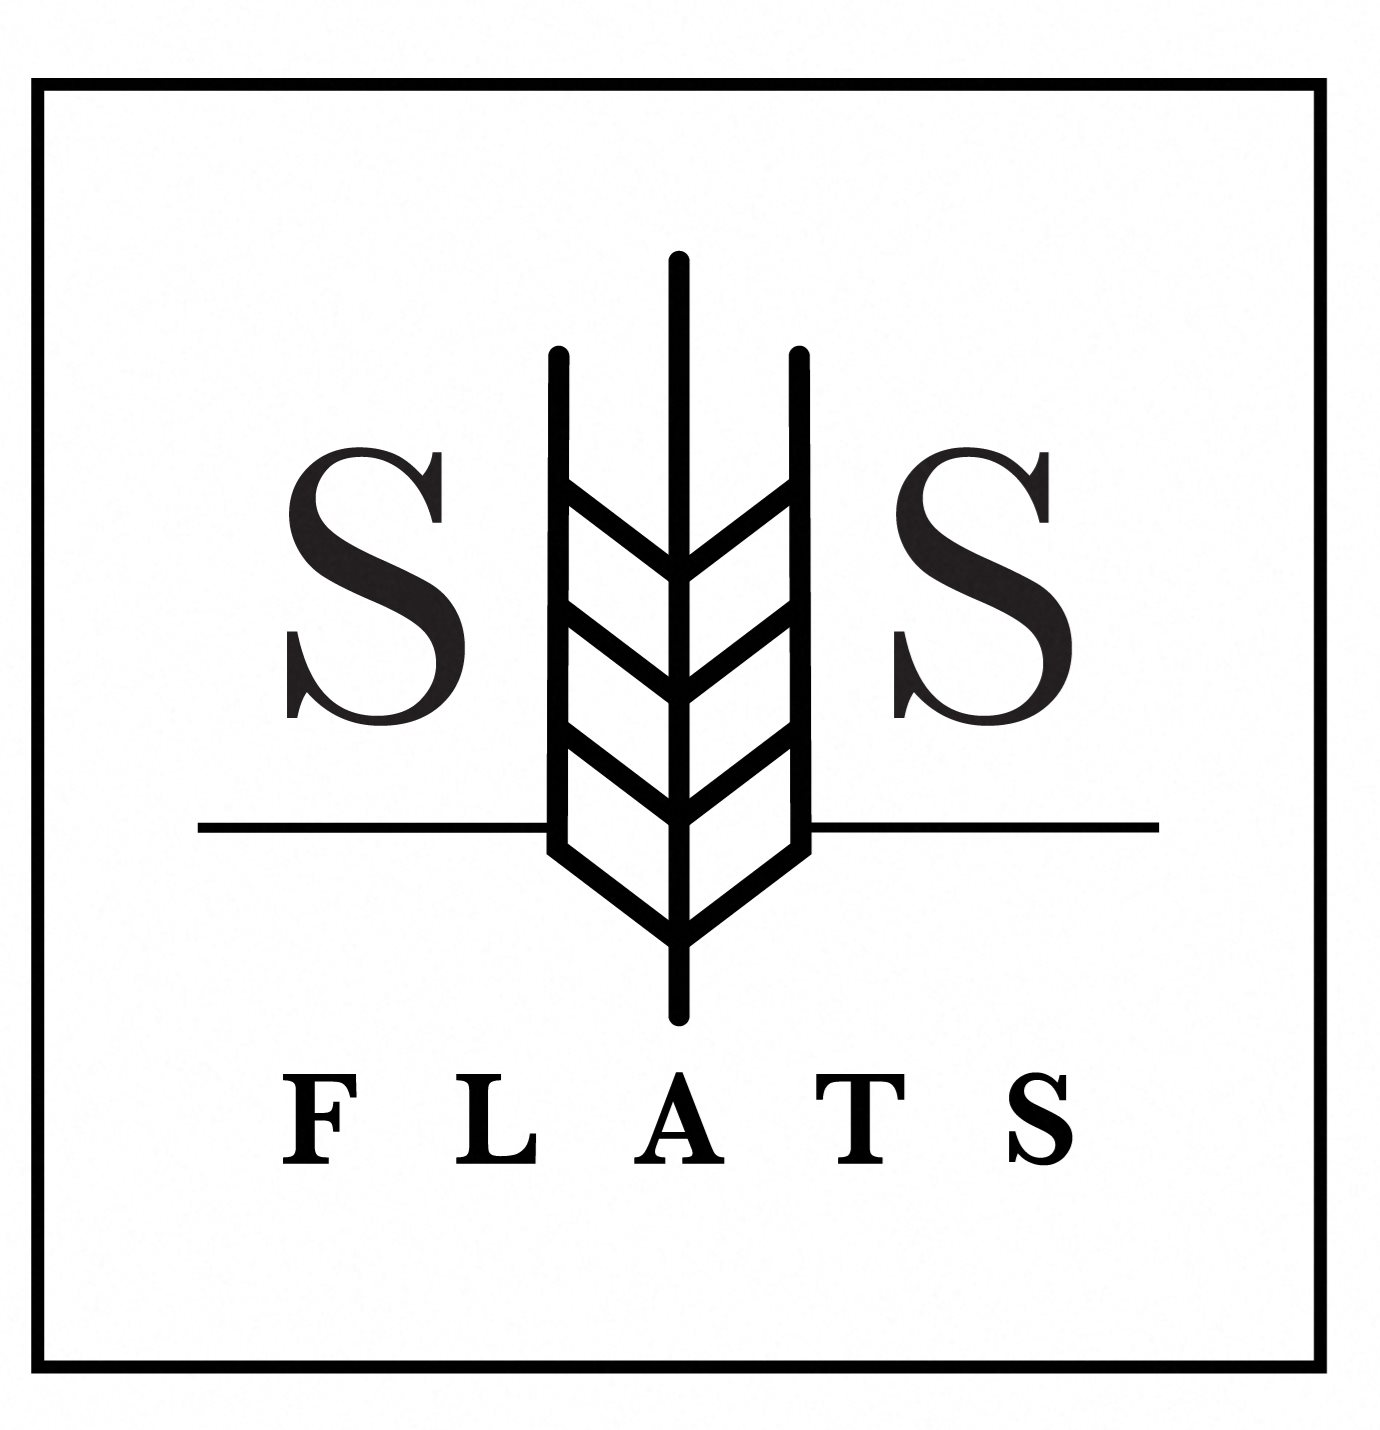 Savier Street Flatts Logo